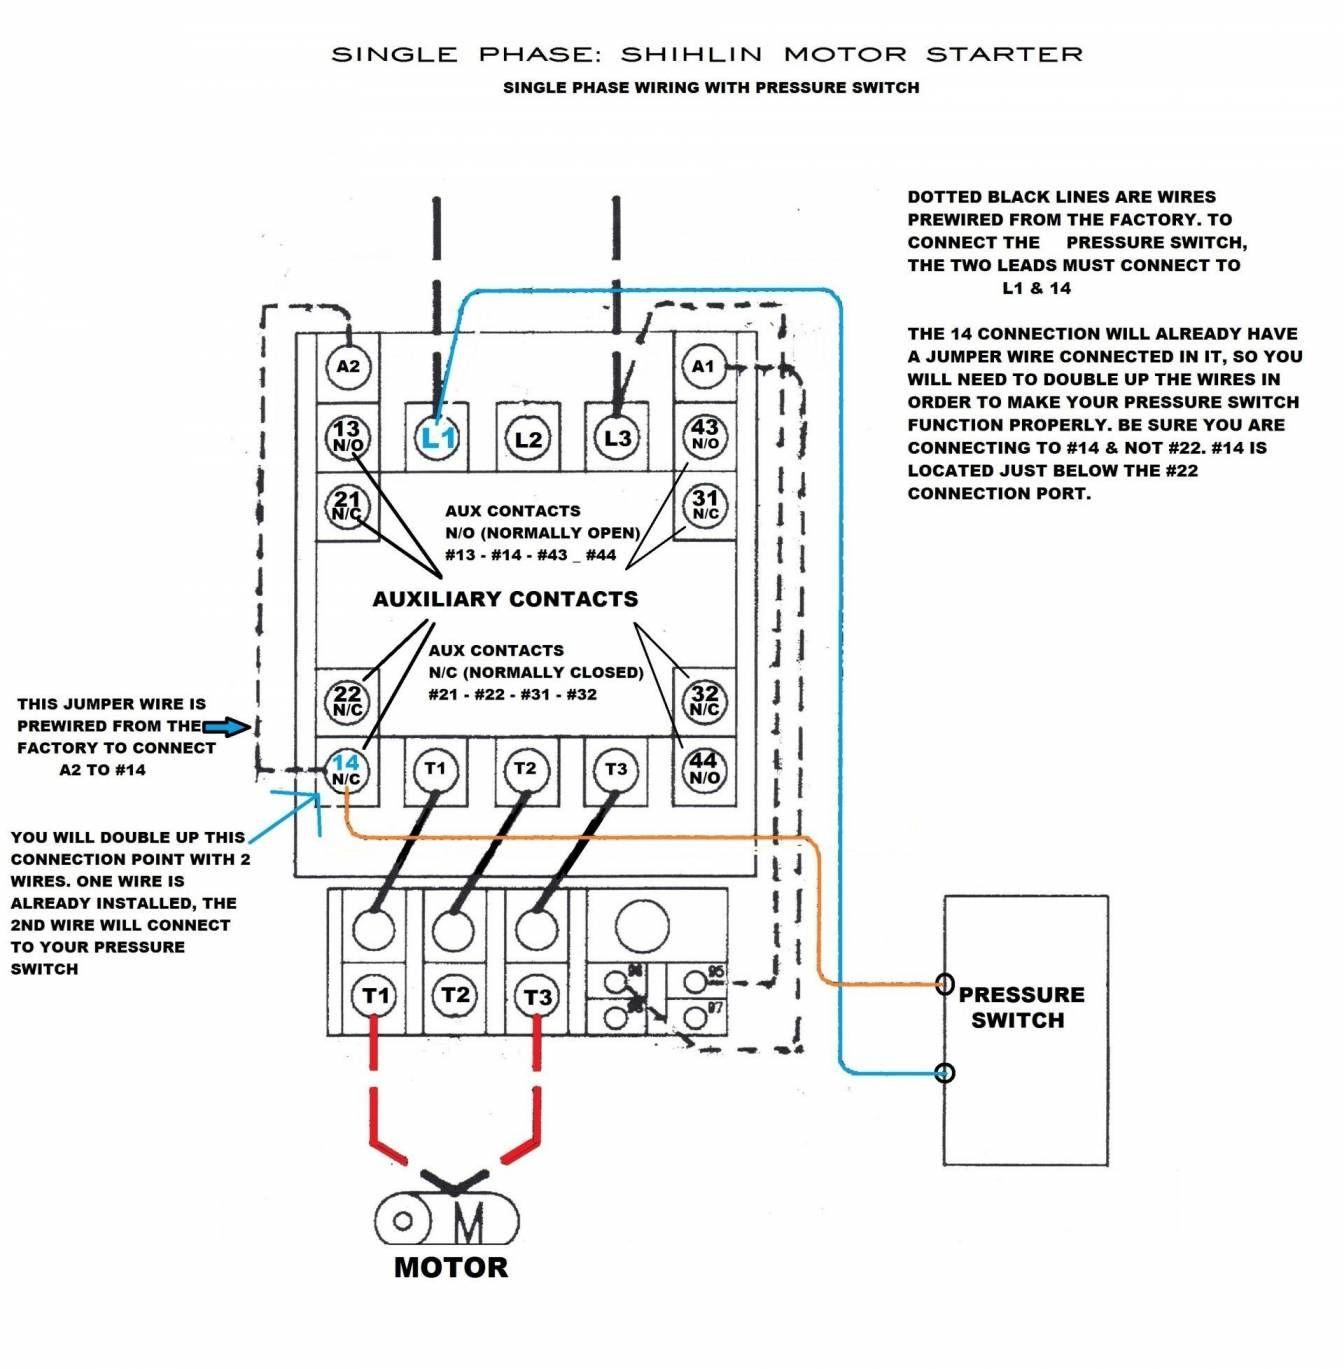 16 Siemens Wiring Diagrams In 2020 Well Pump Pressure Switch Wire Car Audio